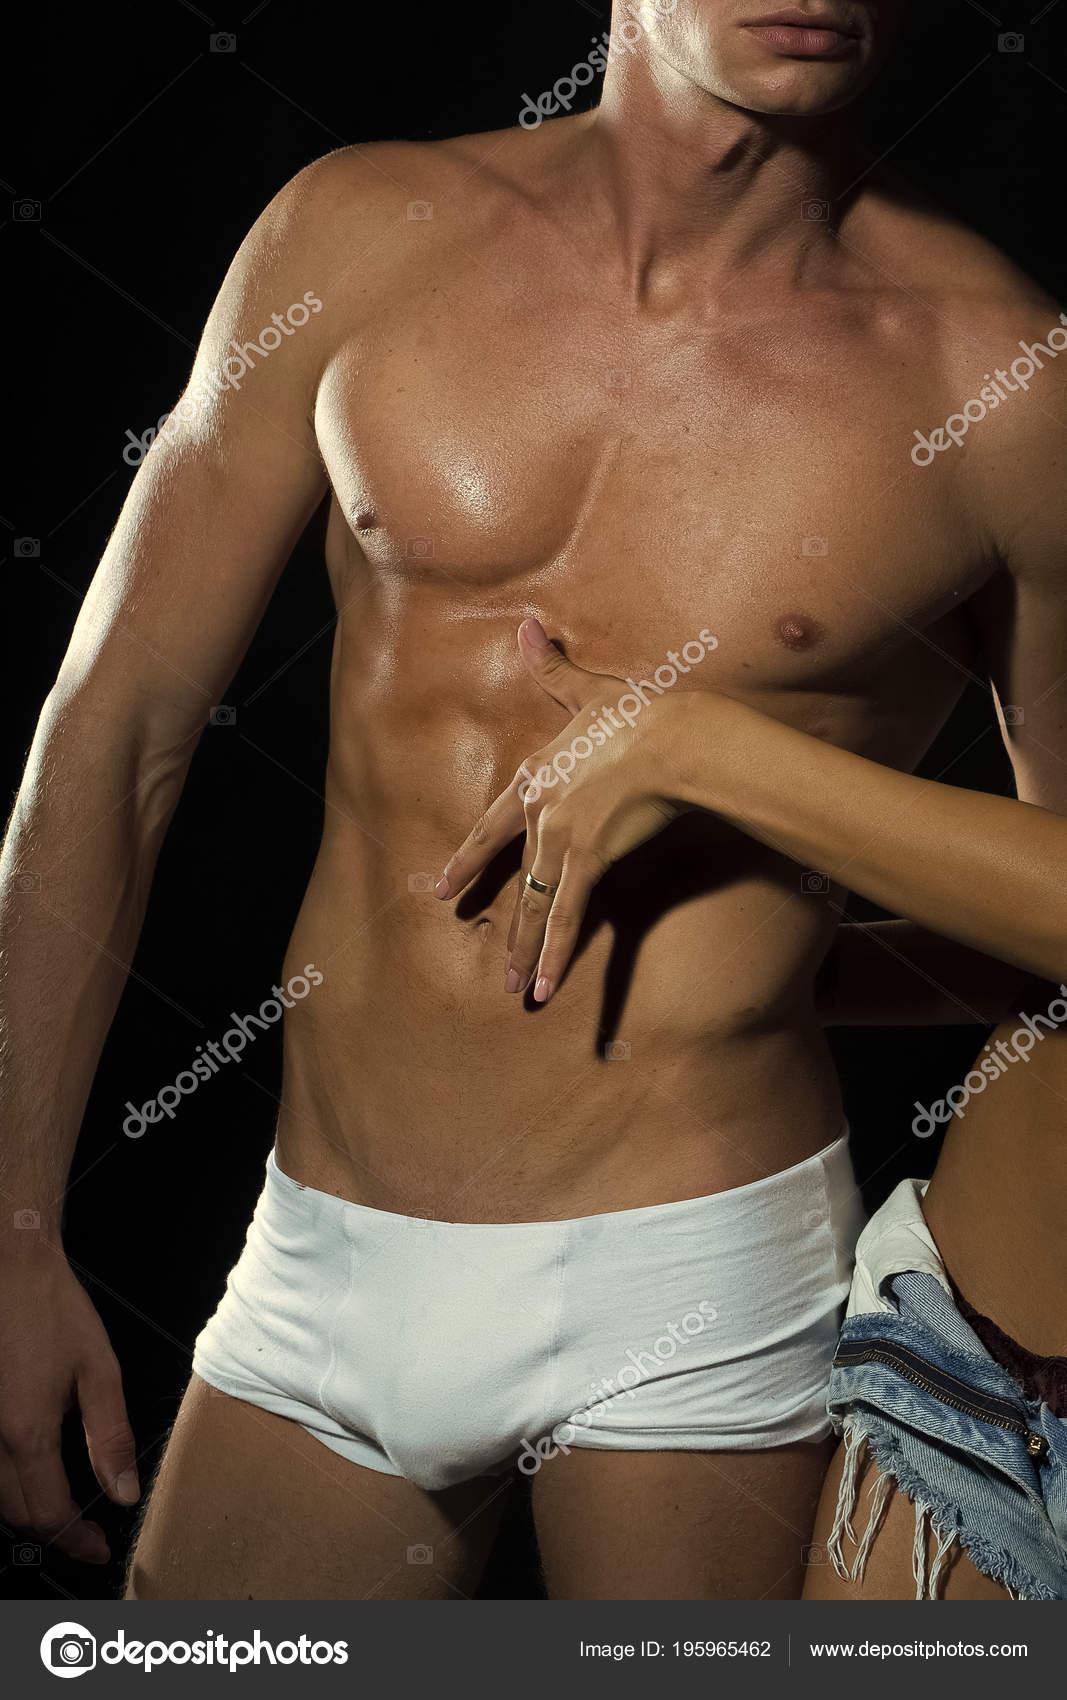 Sangavi nude and fucking pics